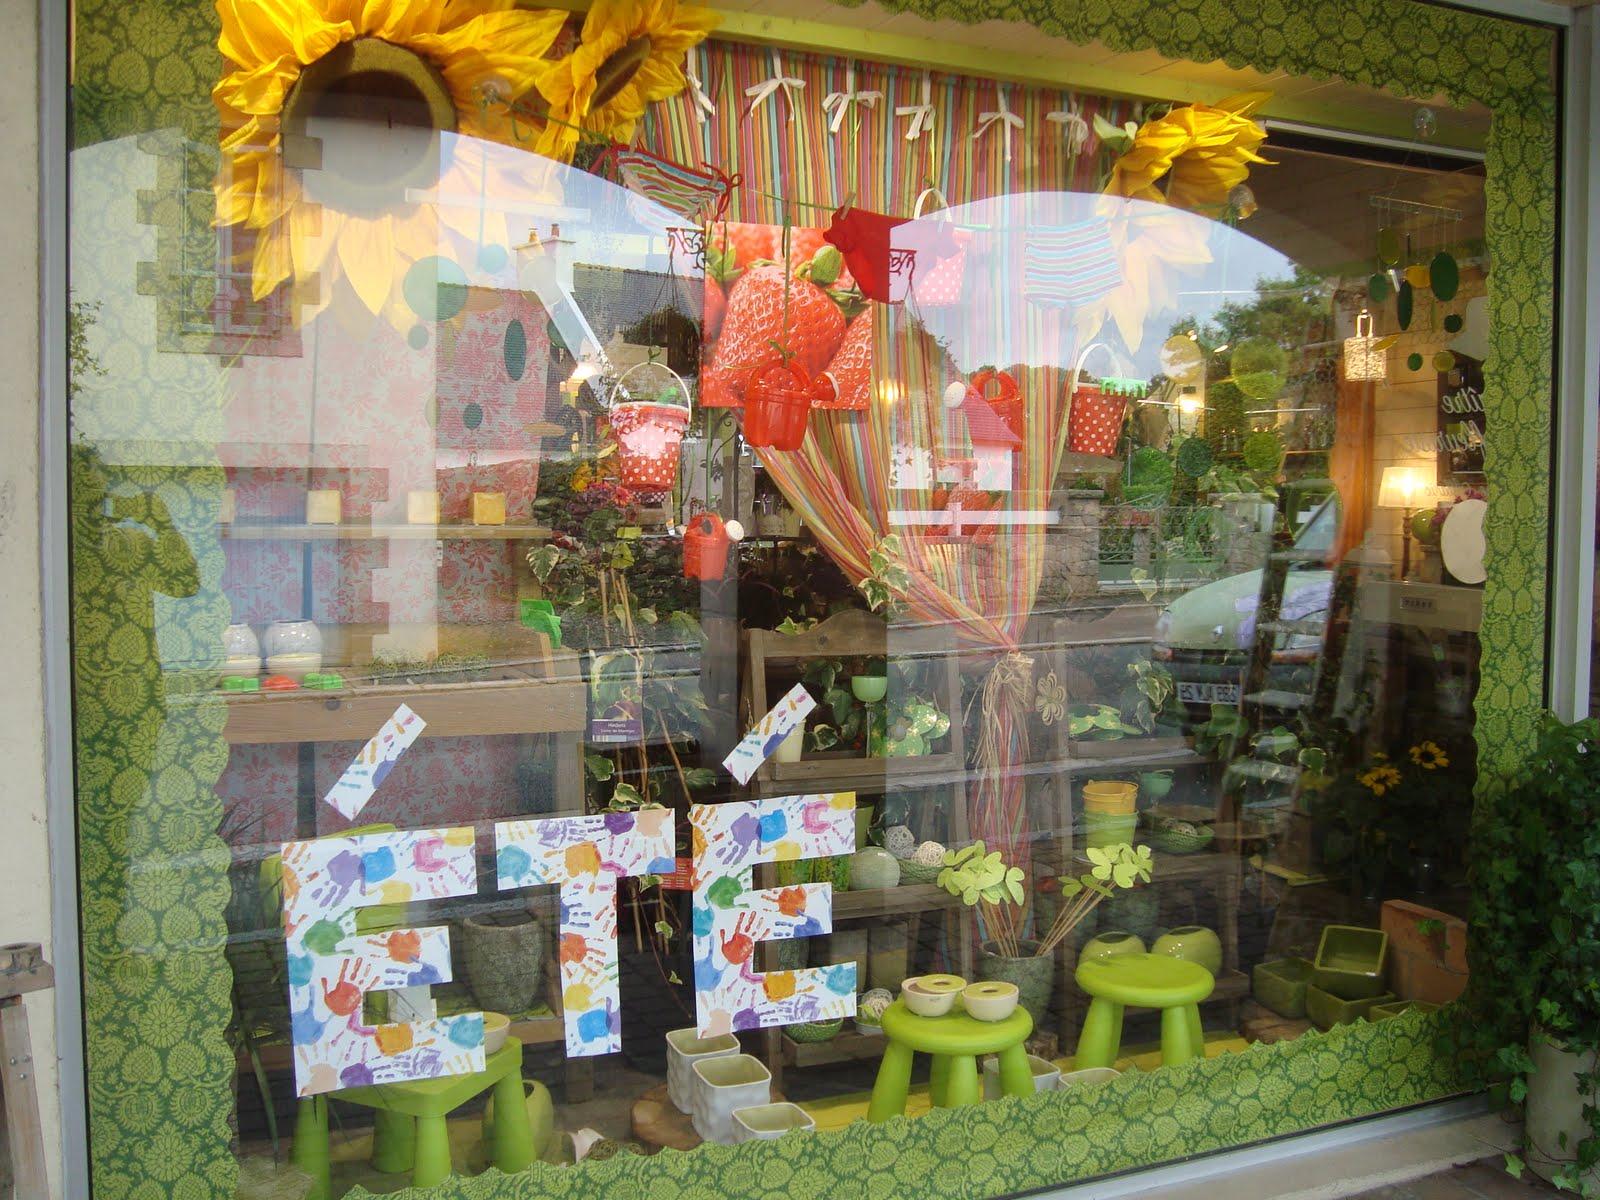 ma tre artisan fleuriste t 2010 le soleil restera dans la vitrine. Black Bedroom Furniture Sets. Home Design Ideas